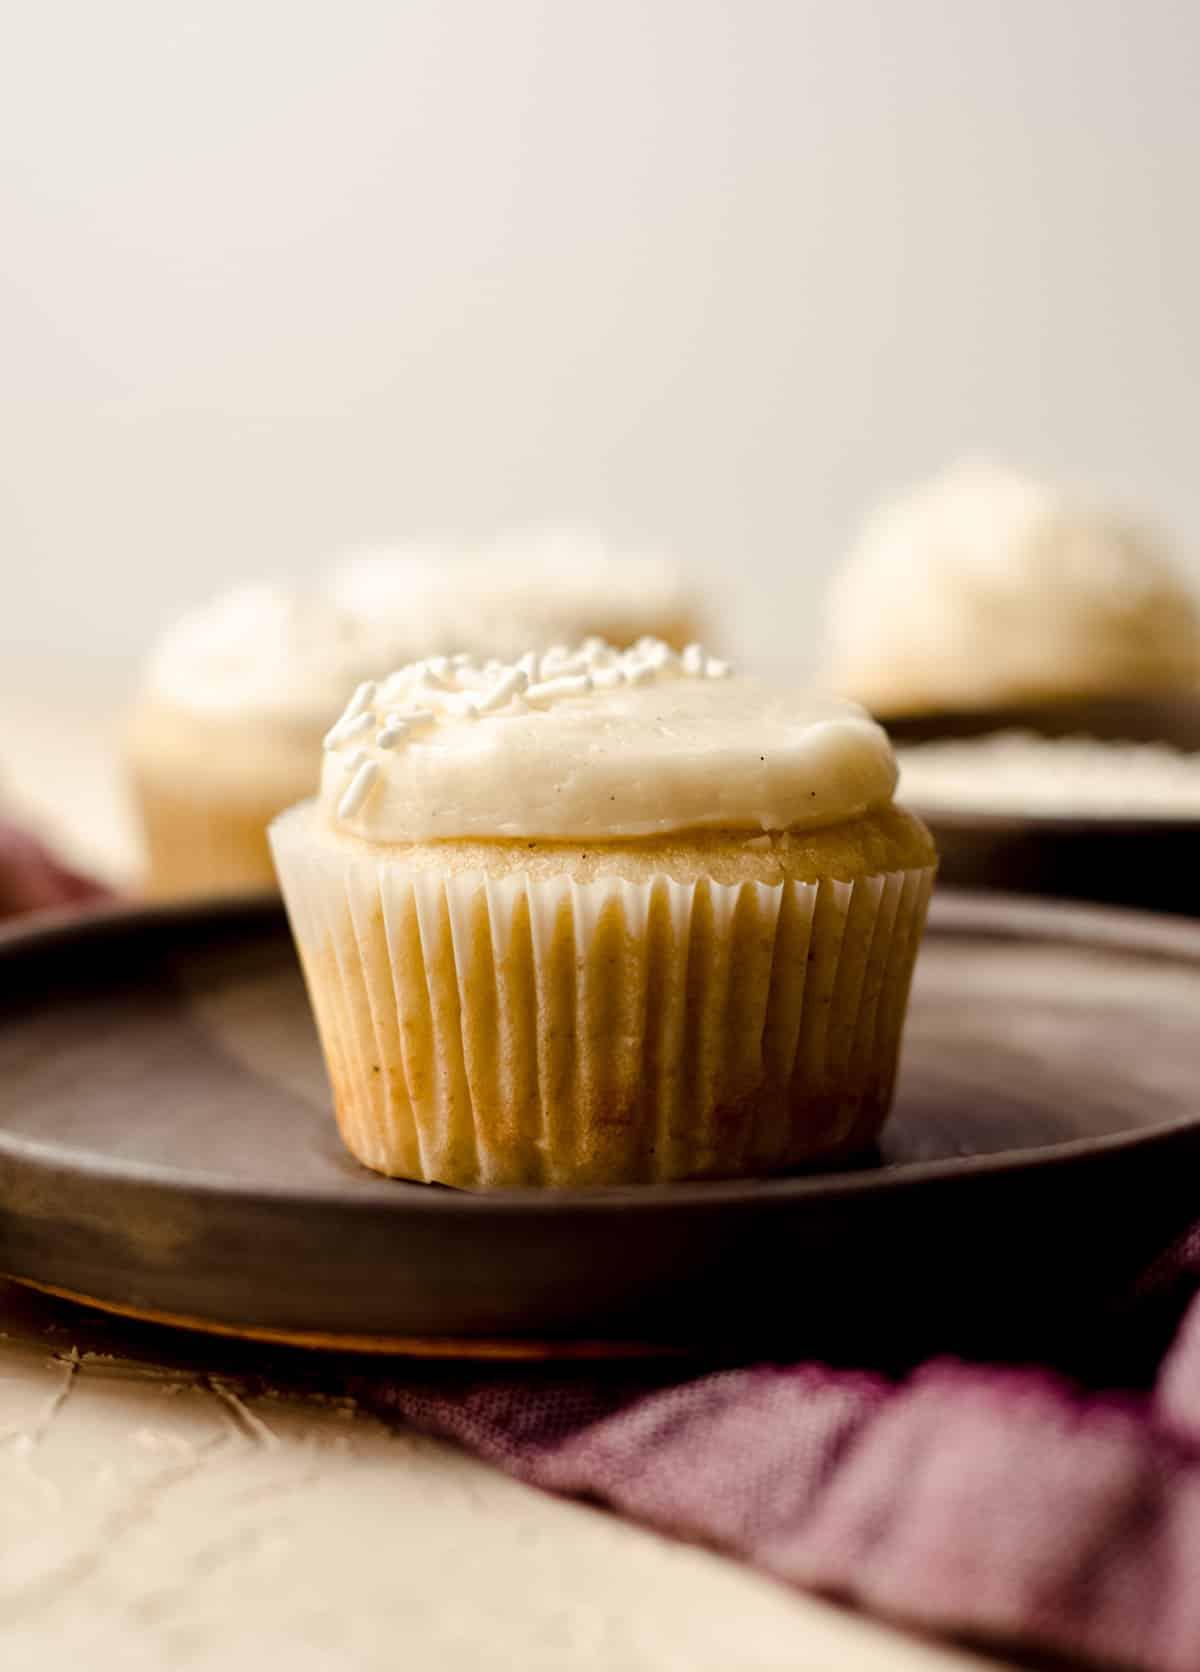 vanilla bean cupcake on a plate